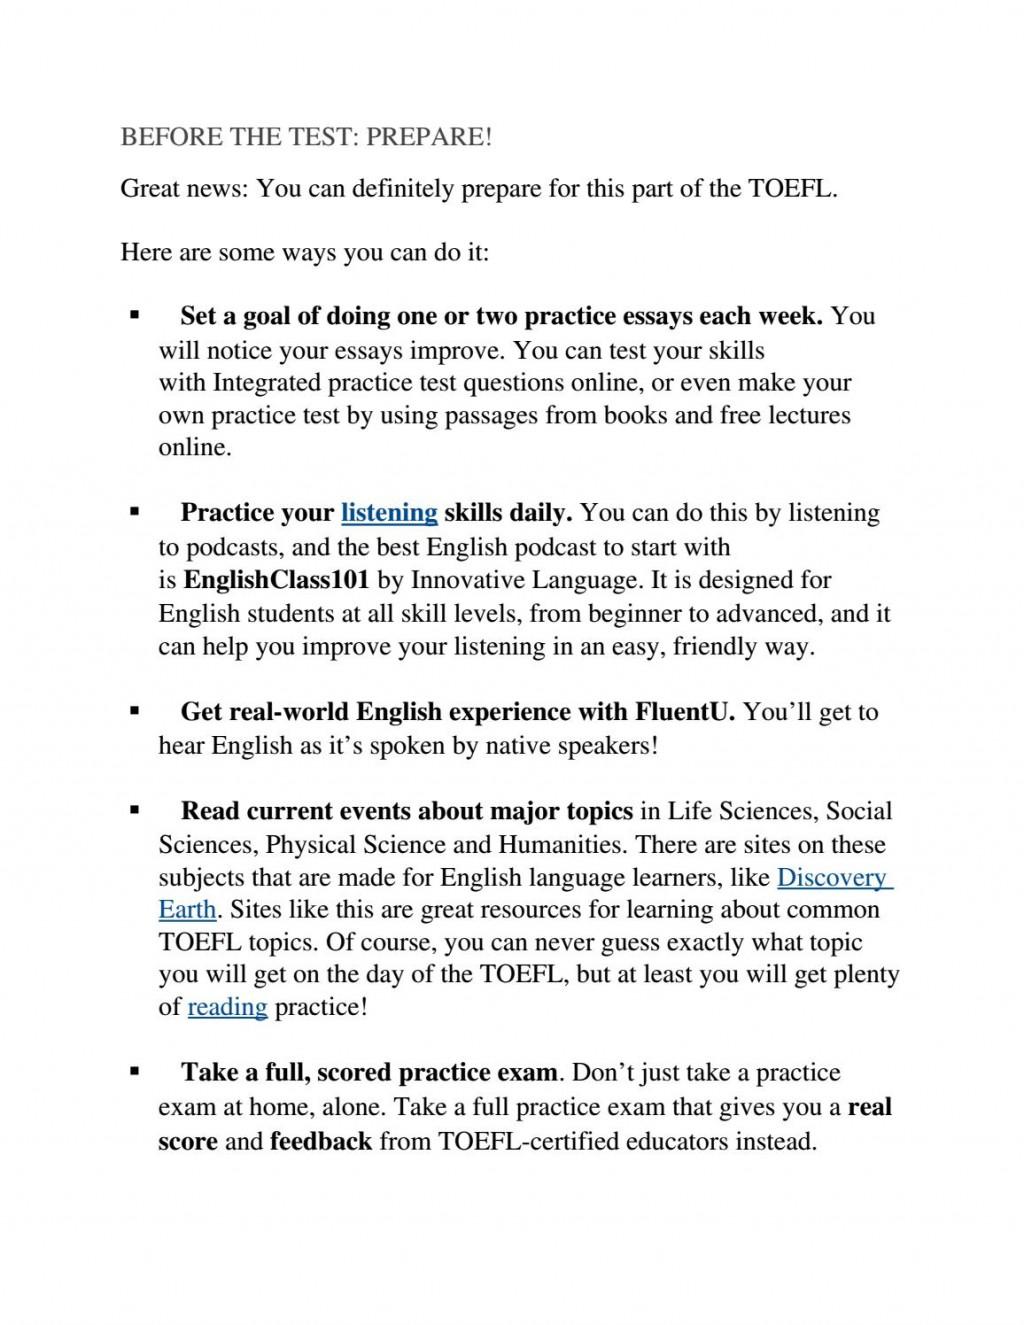 020 Page 1 Essay Toefl Topics Dreaded 2017 185 Pdf Ets Large